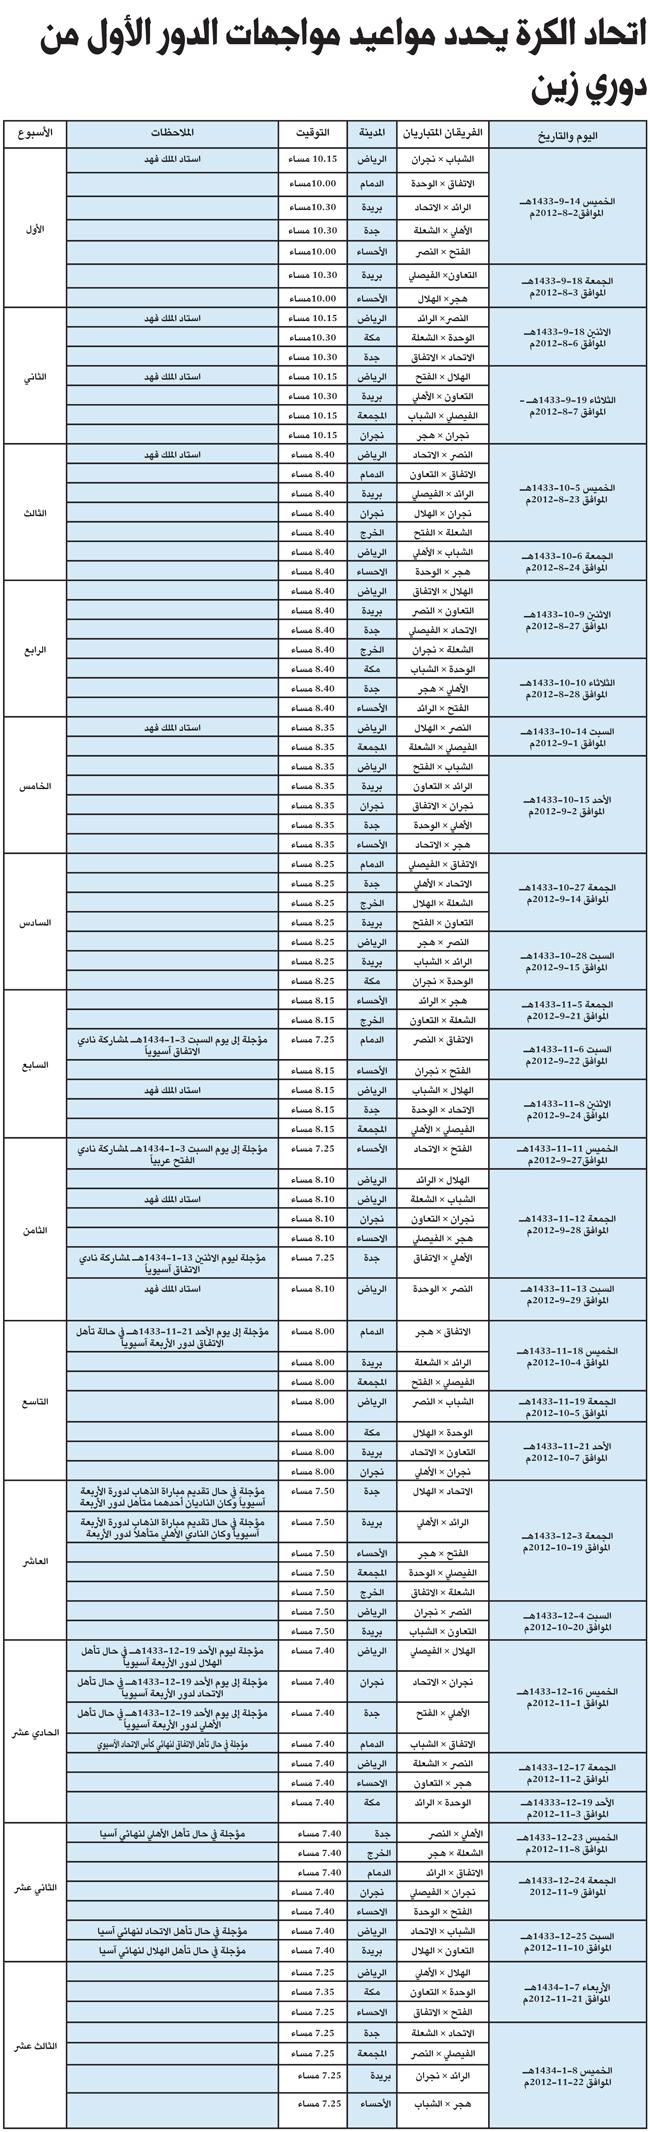 جدول دوري للموسم الرياضي 1433هــ